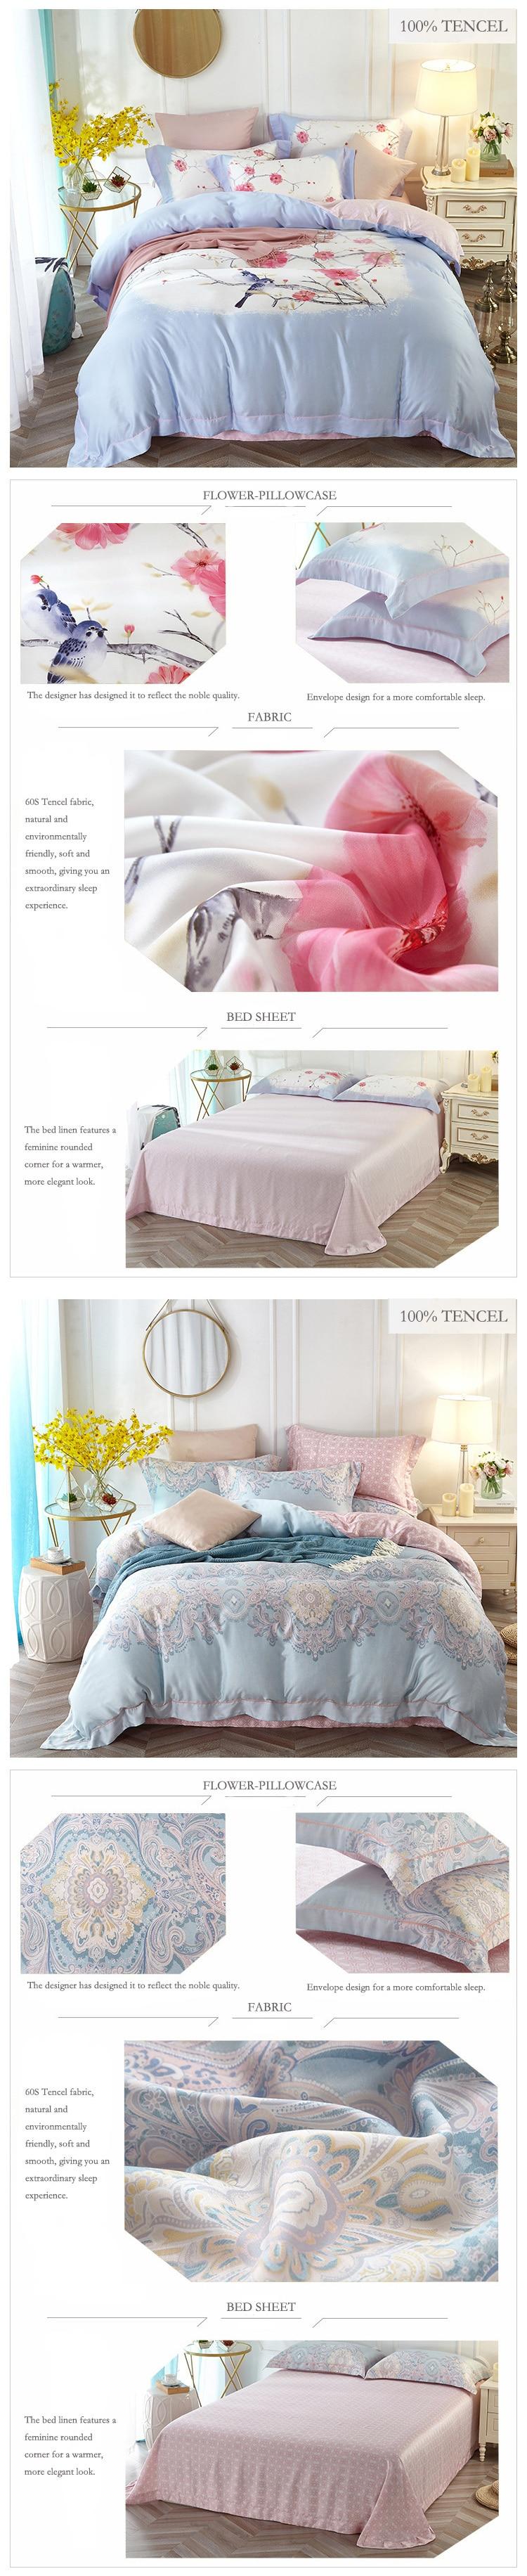 princess bedding set tencel cotton wedding bed set home textile plant flower bed linen king size comforter set bettwasche 08